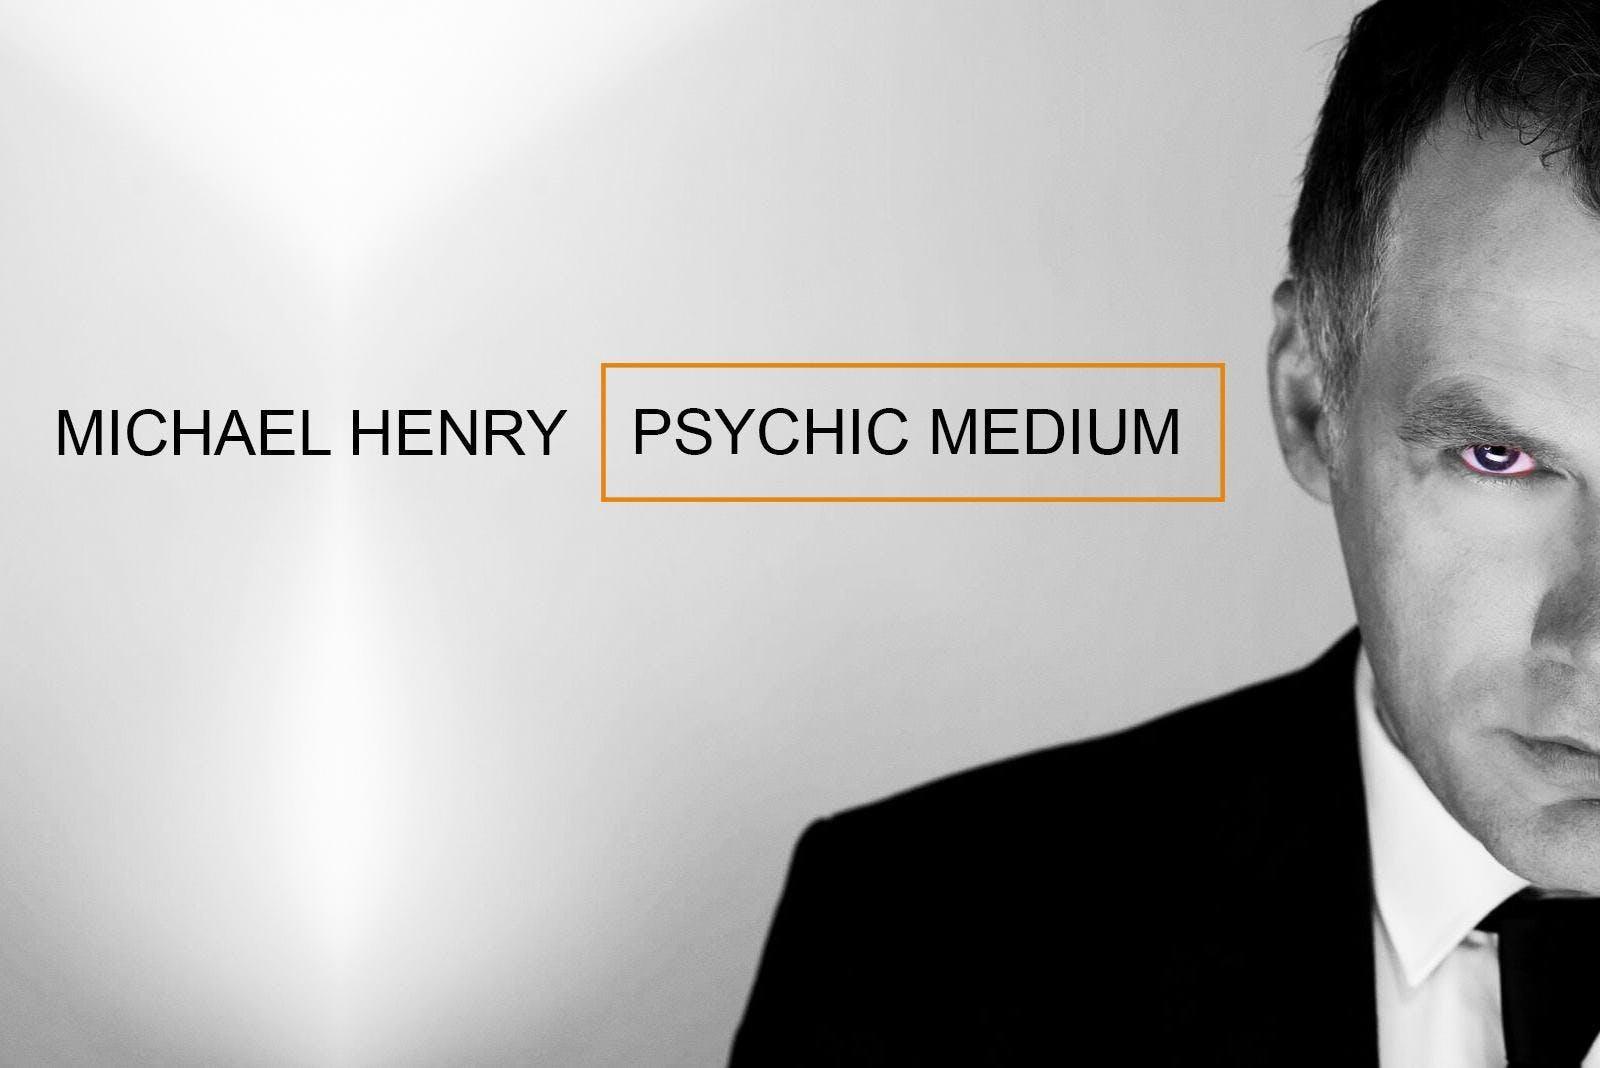 MICHAEL HENRY :Psychic Medium - Armagh